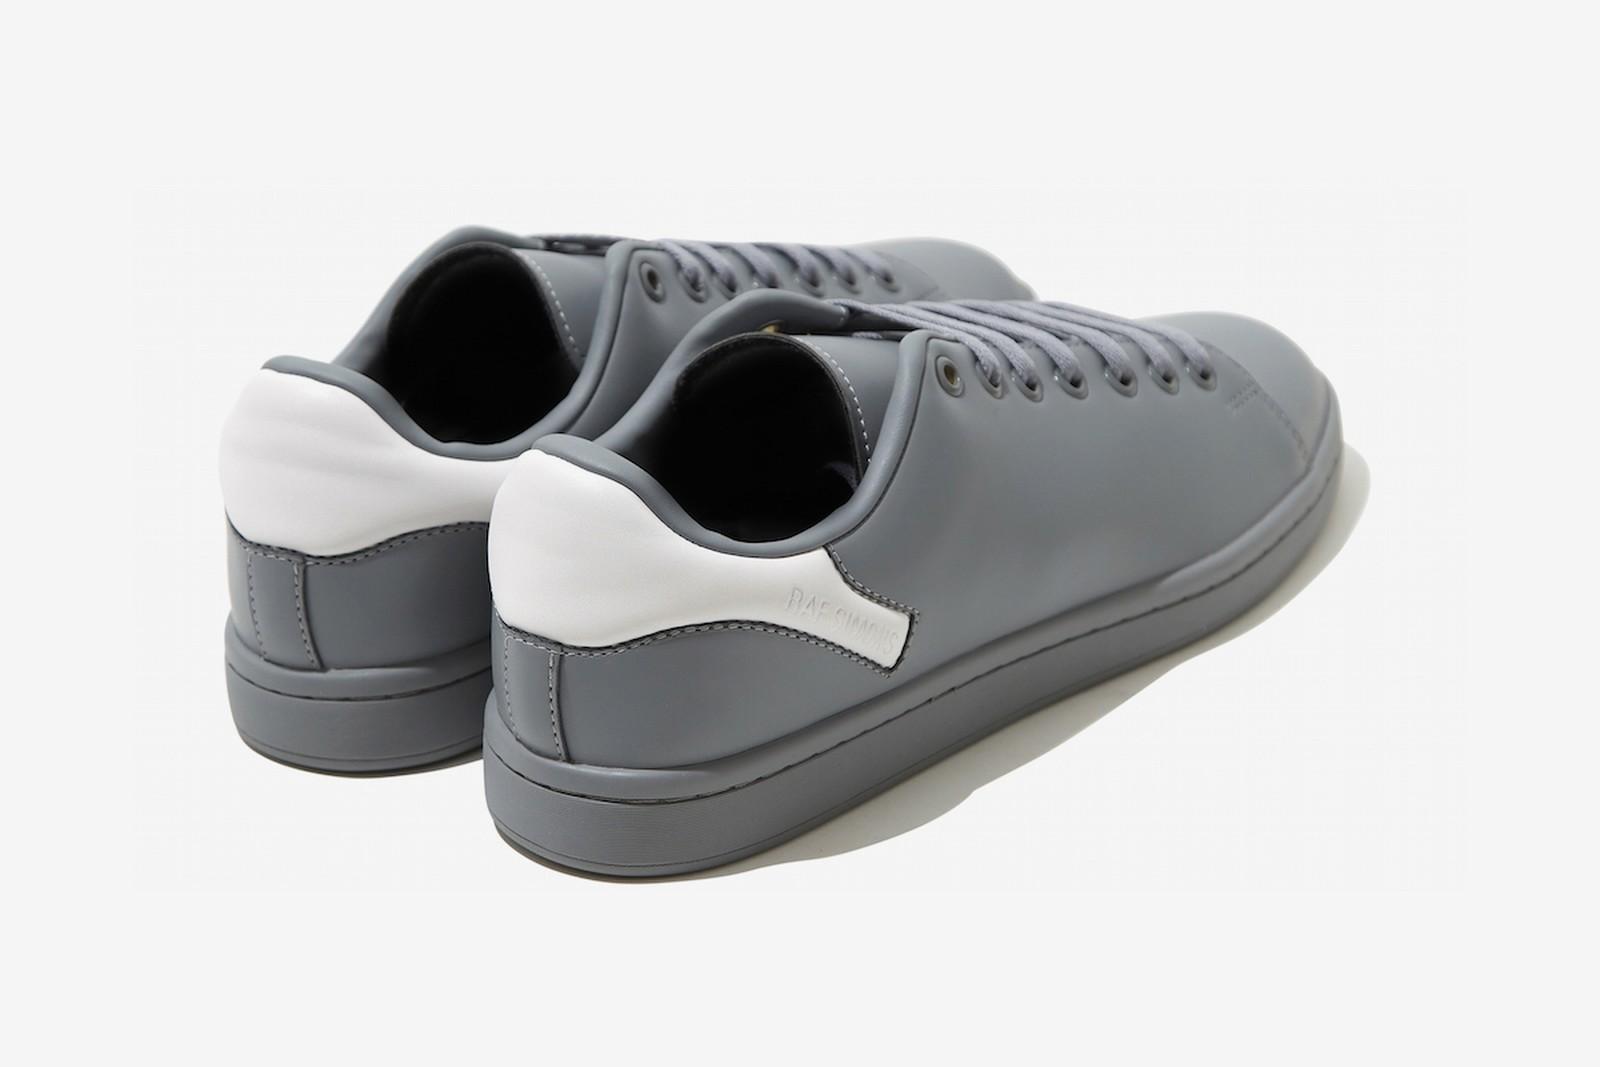 raf-simons-shoes-dtf-magazine-05-2